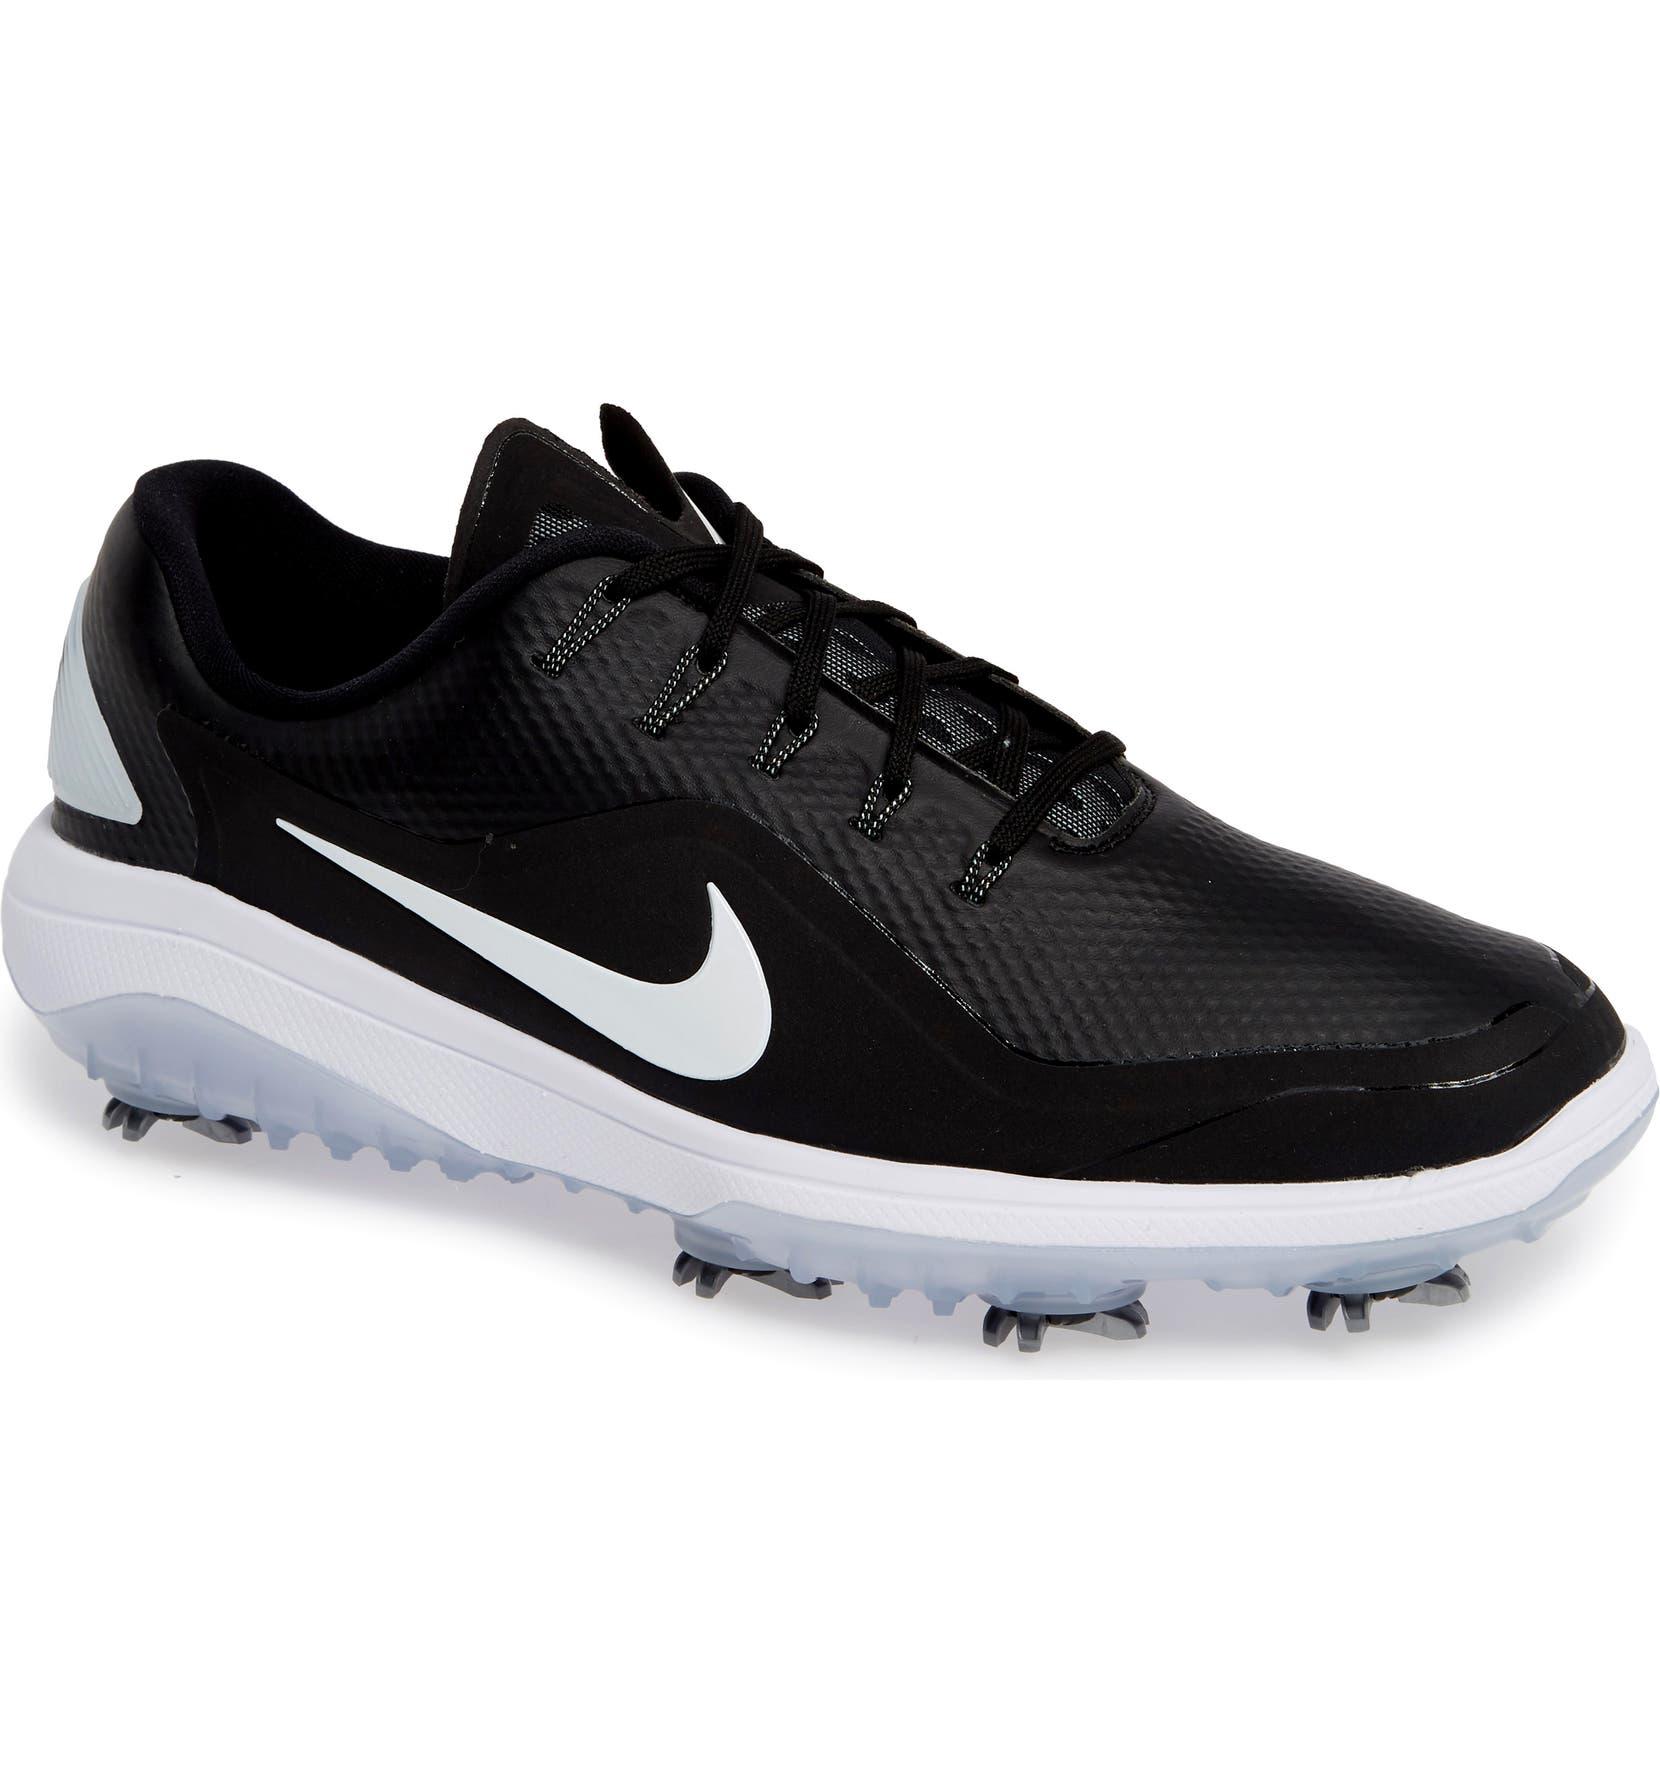 premium selection a1b7d 3d4c9 React Vapor 2 Golf Shoe